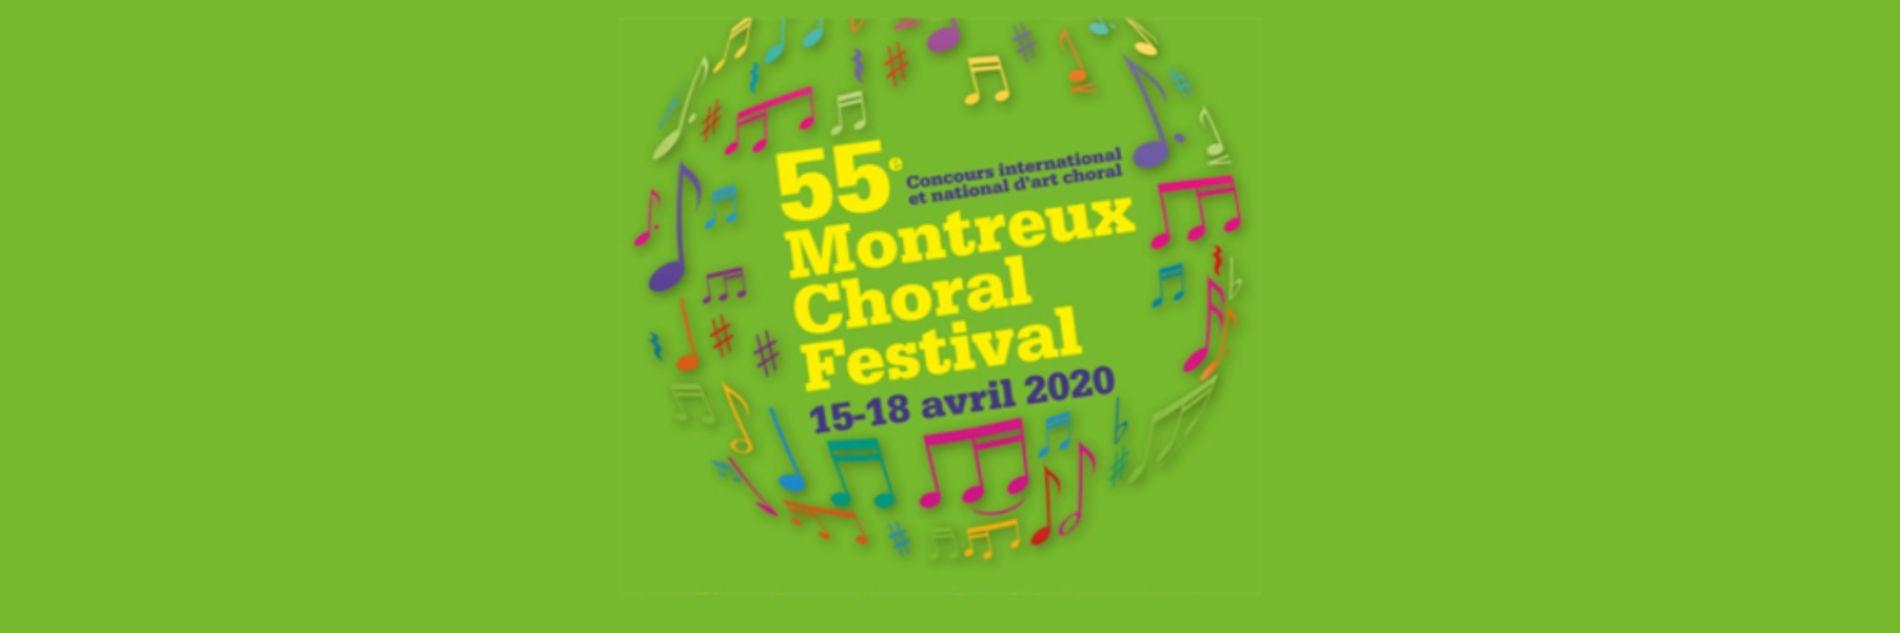 Montreux Choral Festival 2021